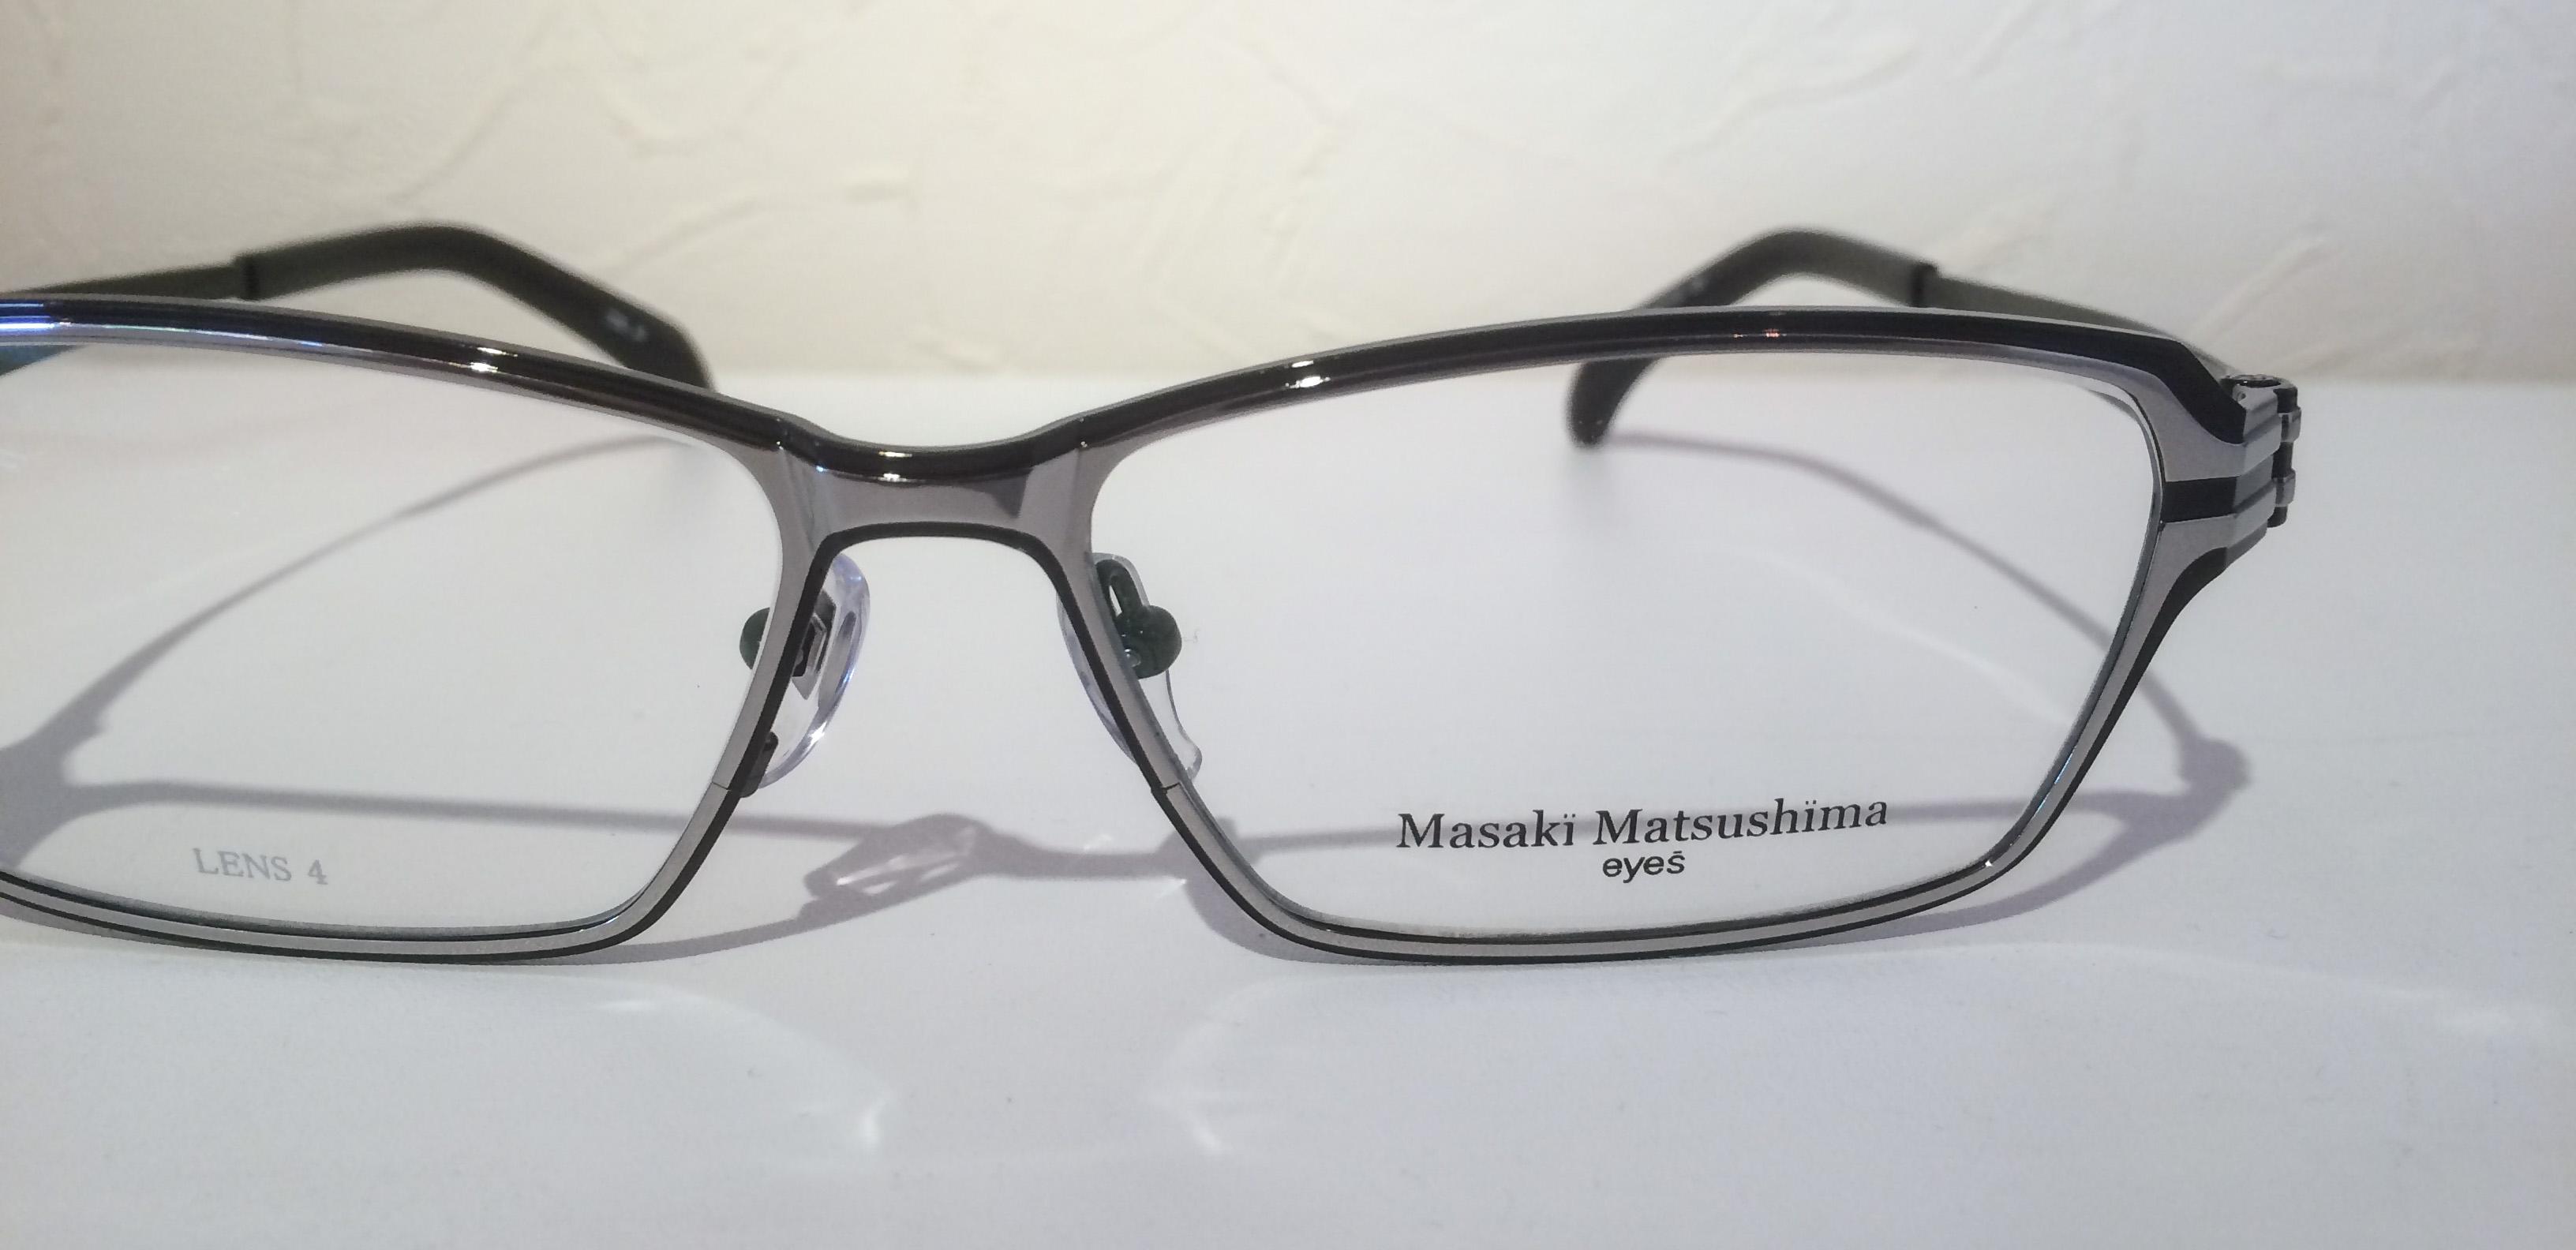 Masaki Matsushima New model!(二見)_a0150916_126167.jpg